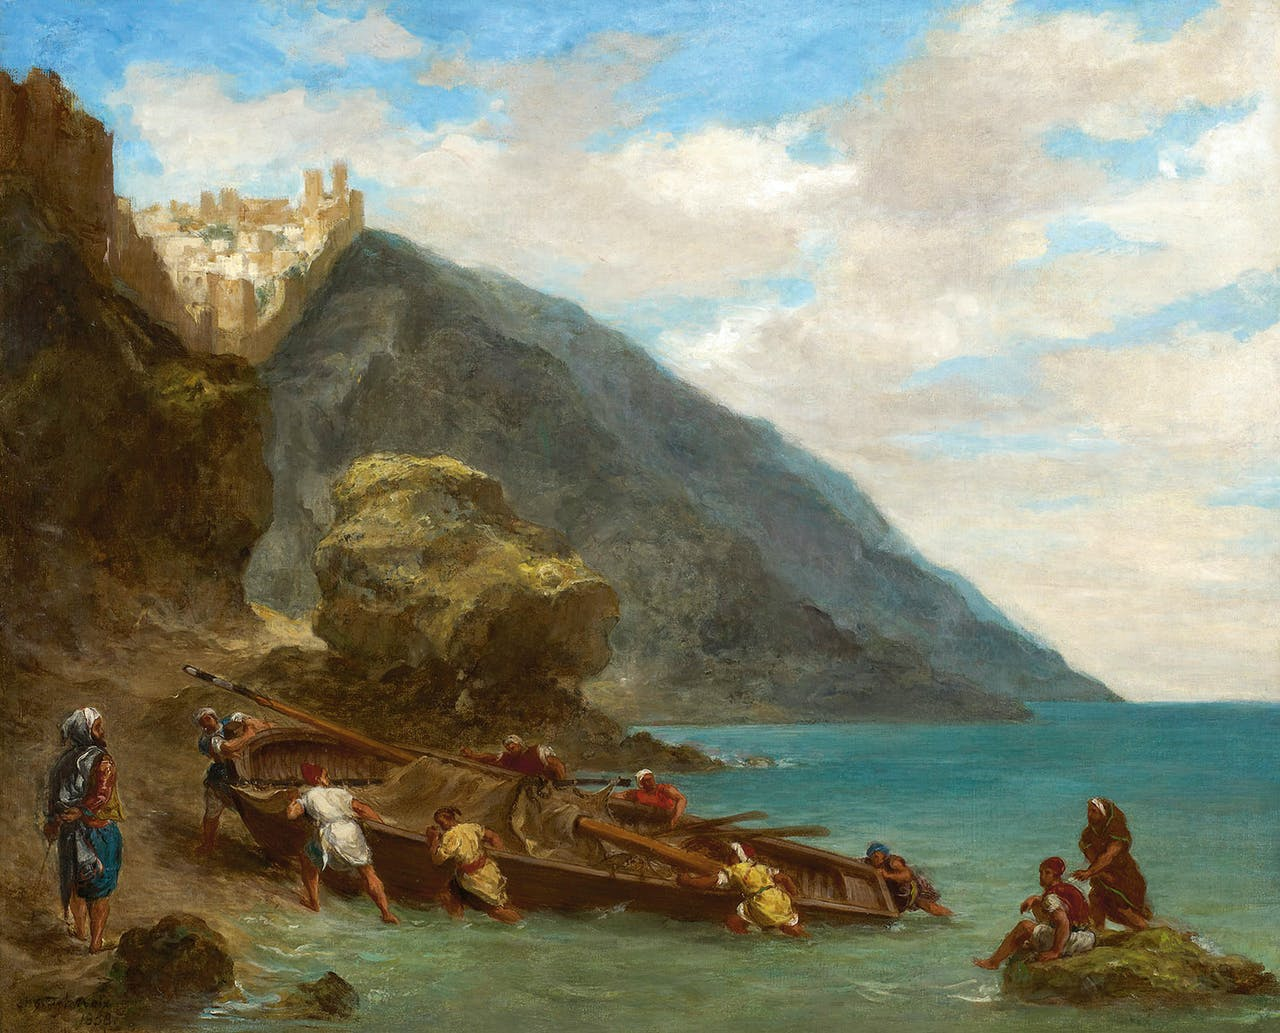 Eugène Delacroix Tanger vanaf de kust, 1858.